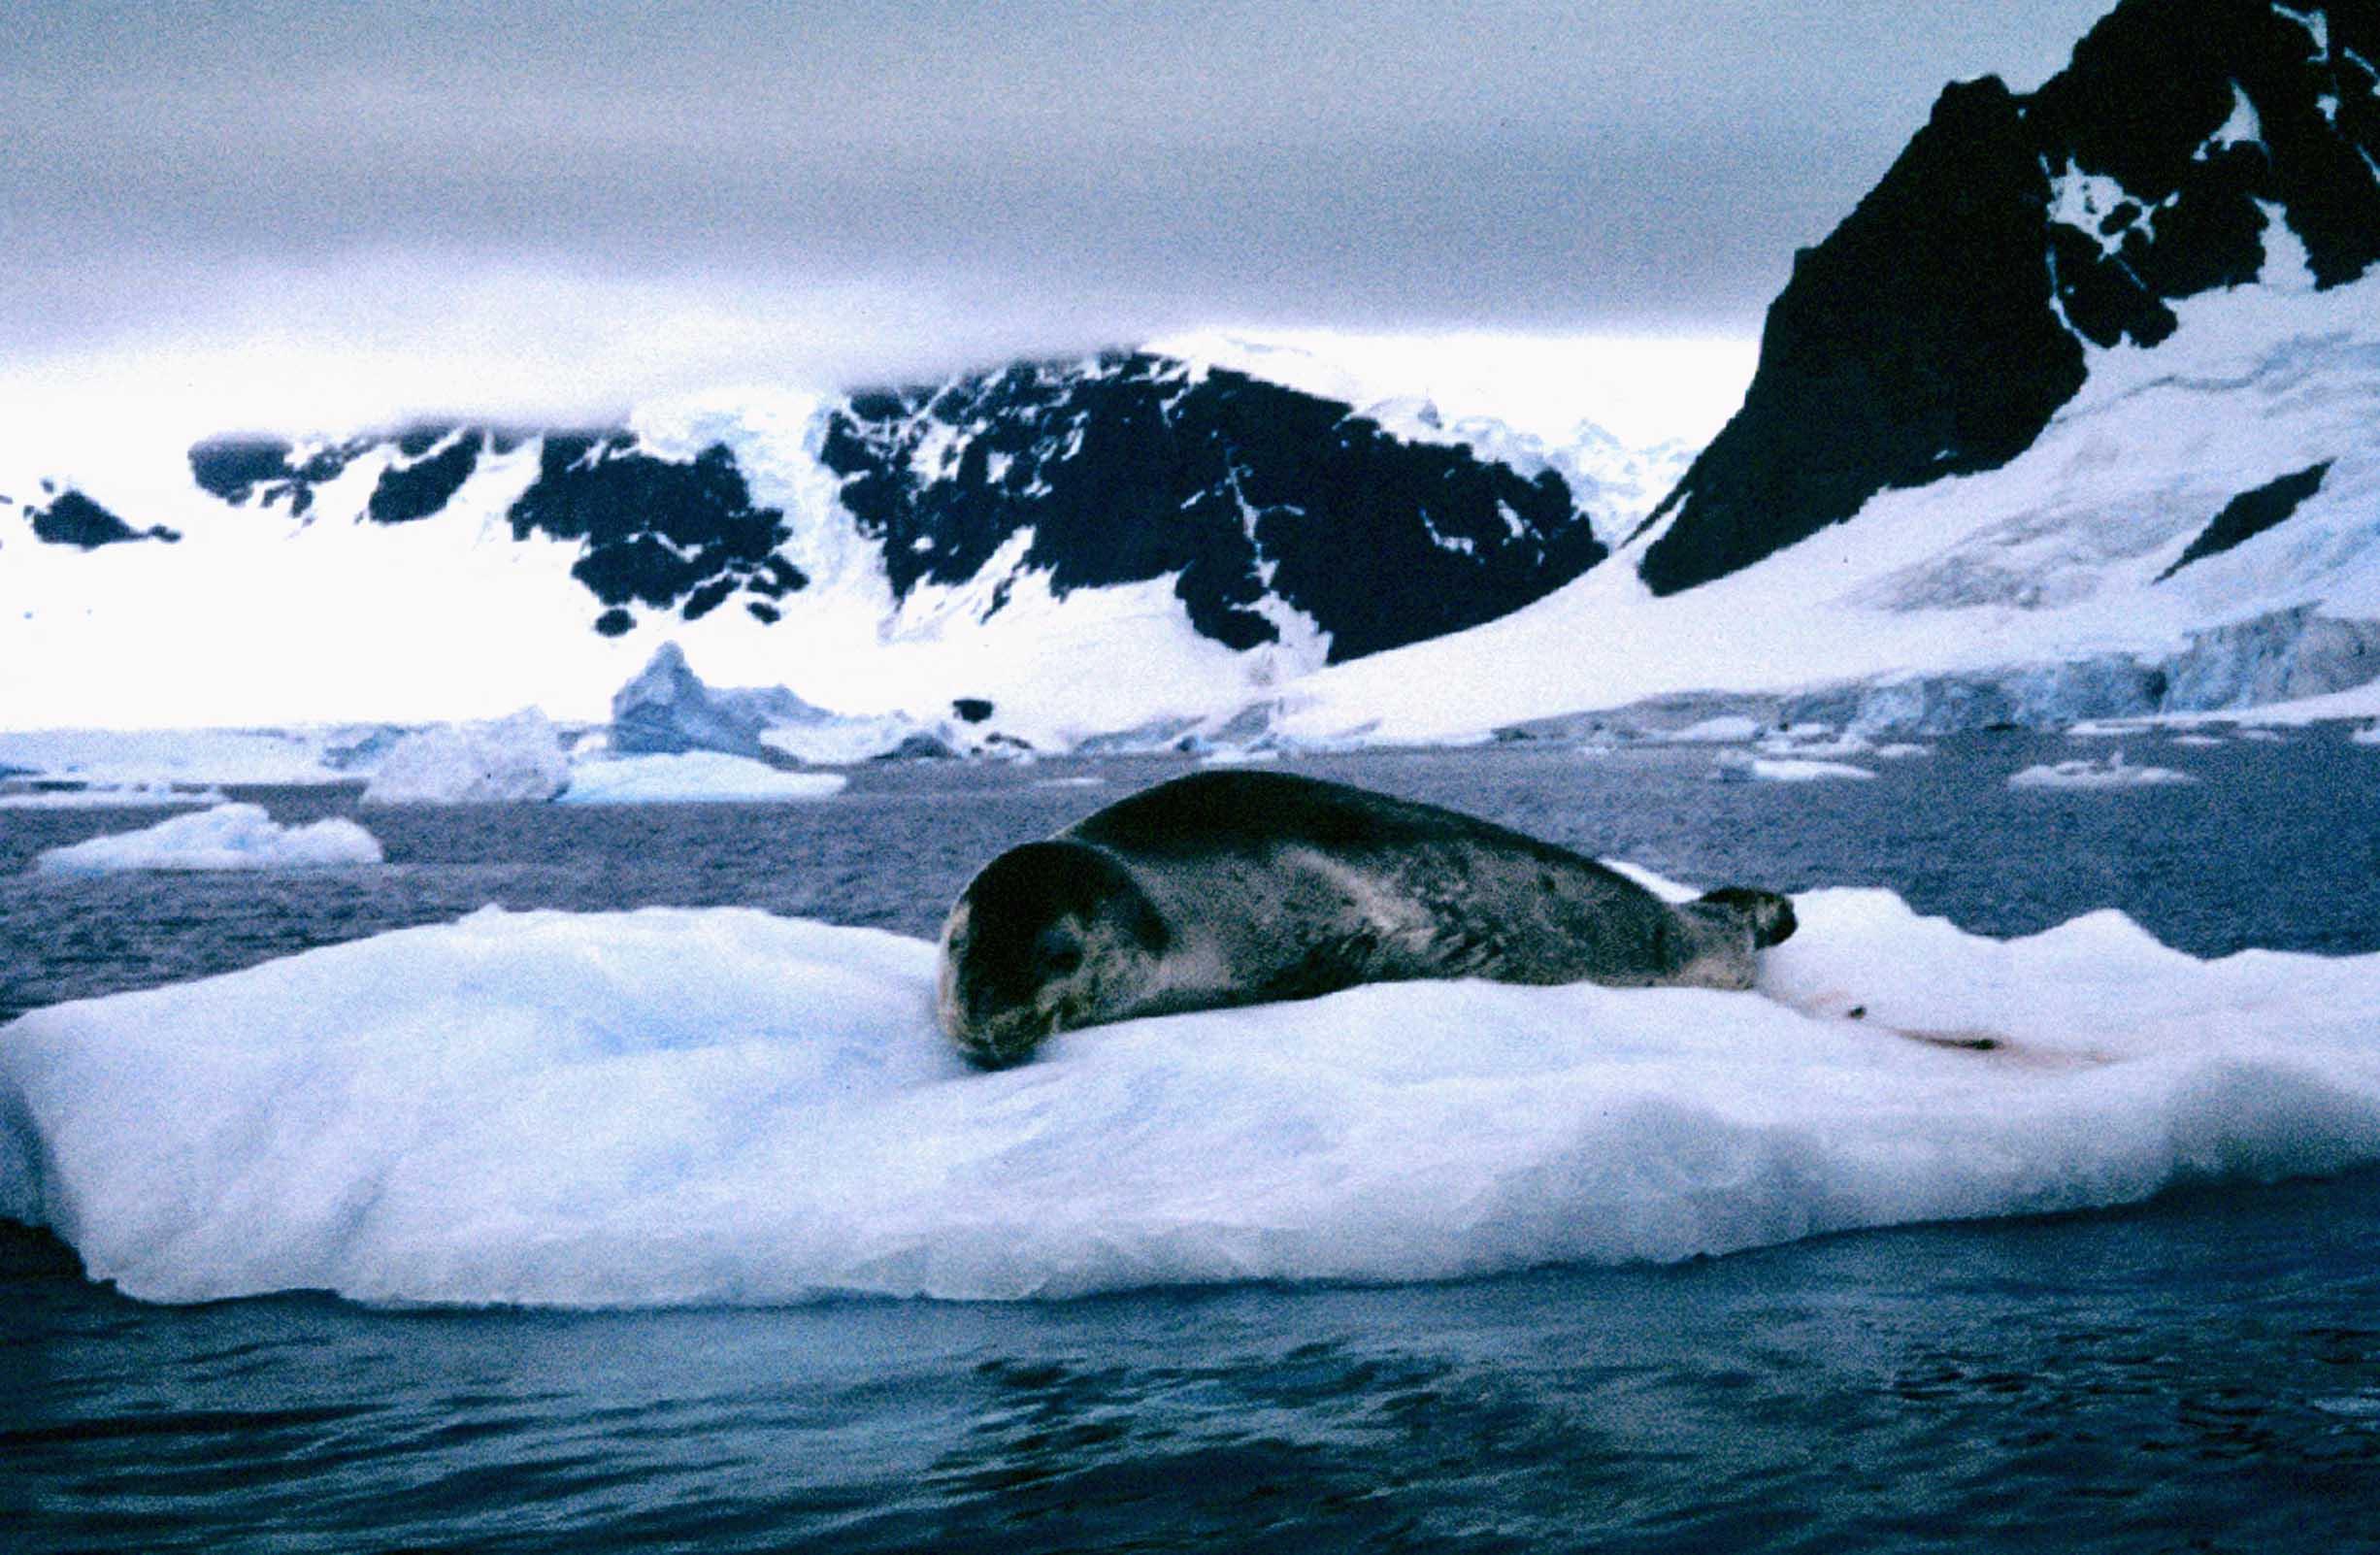 Seal on a small iceberg